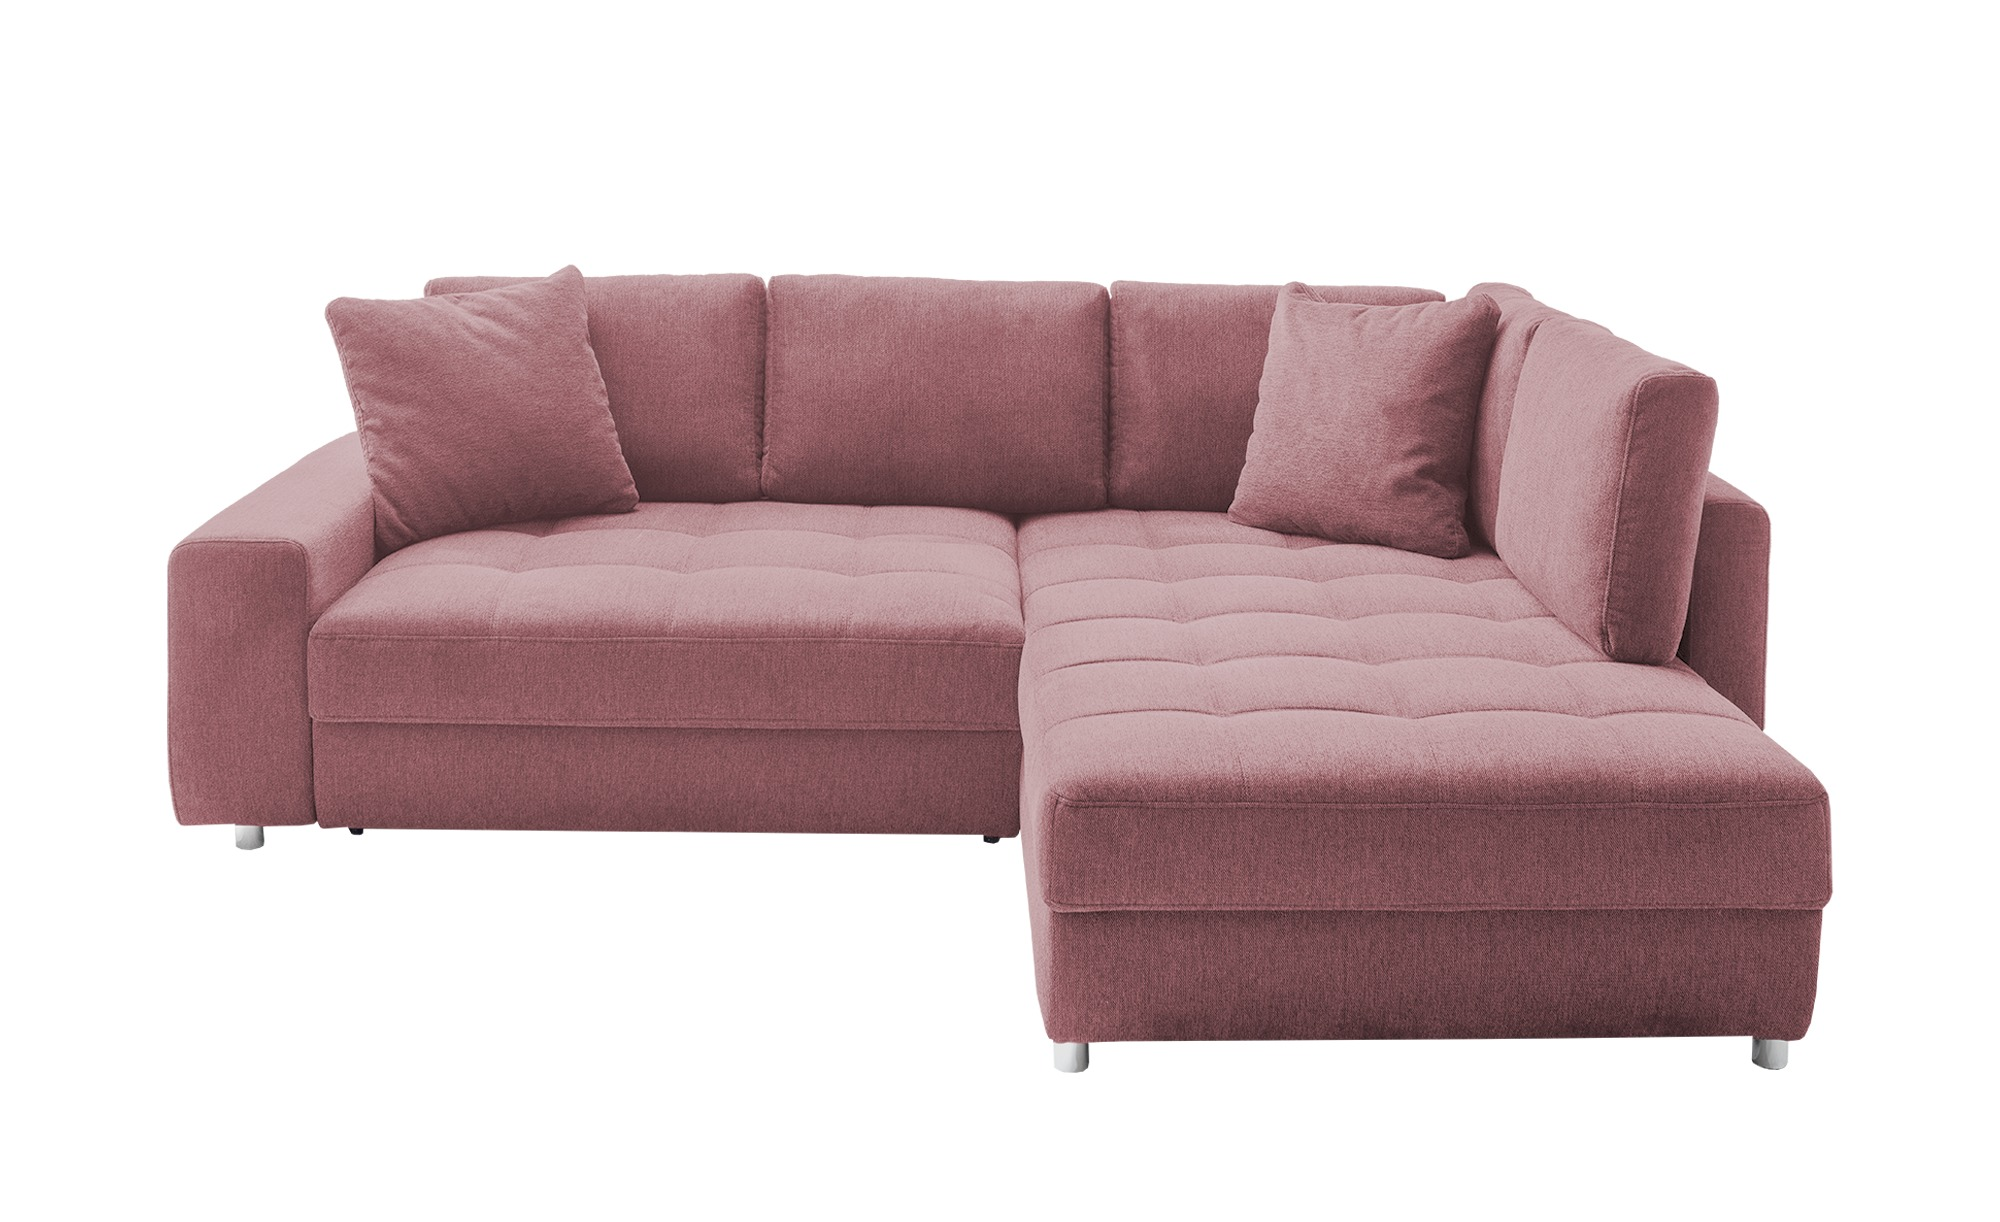 bobb Ecksofa  Arissa de Luxe ¦ rosa/pink ¦ Maße (cm): H: 84 Polstermöbel > Sofas > Ecksofas - Höffner